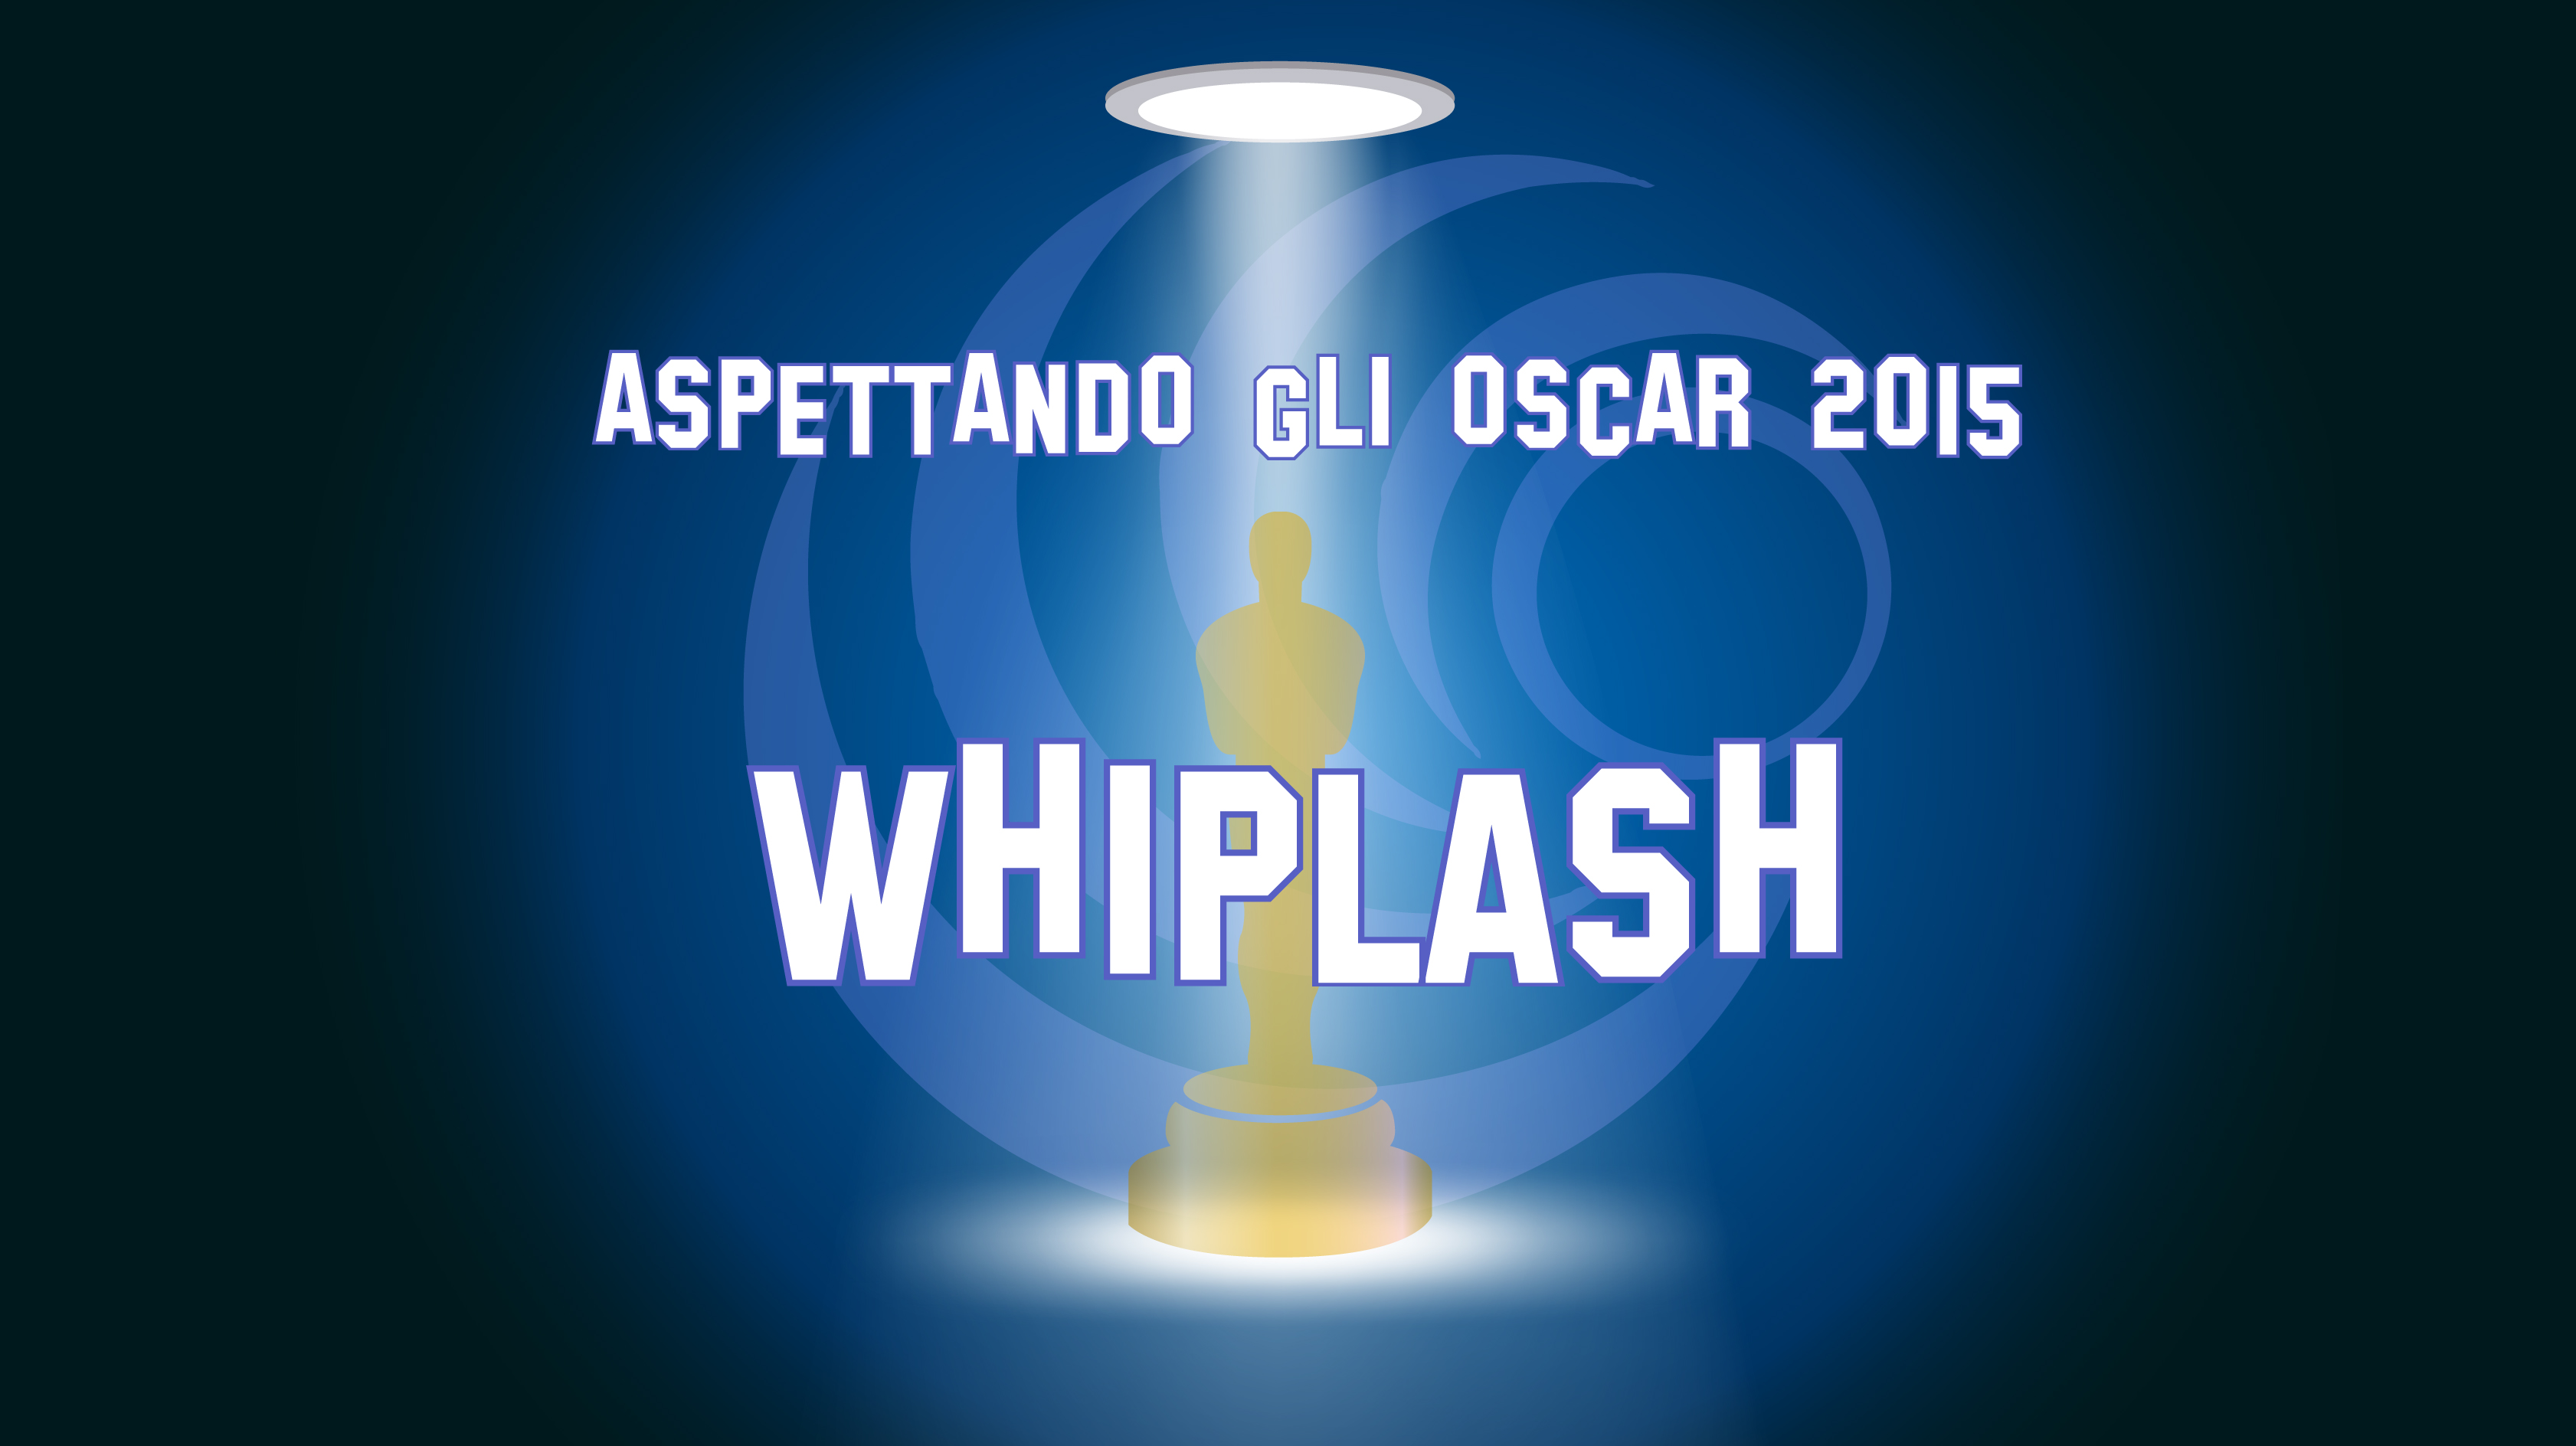 whiplash-01